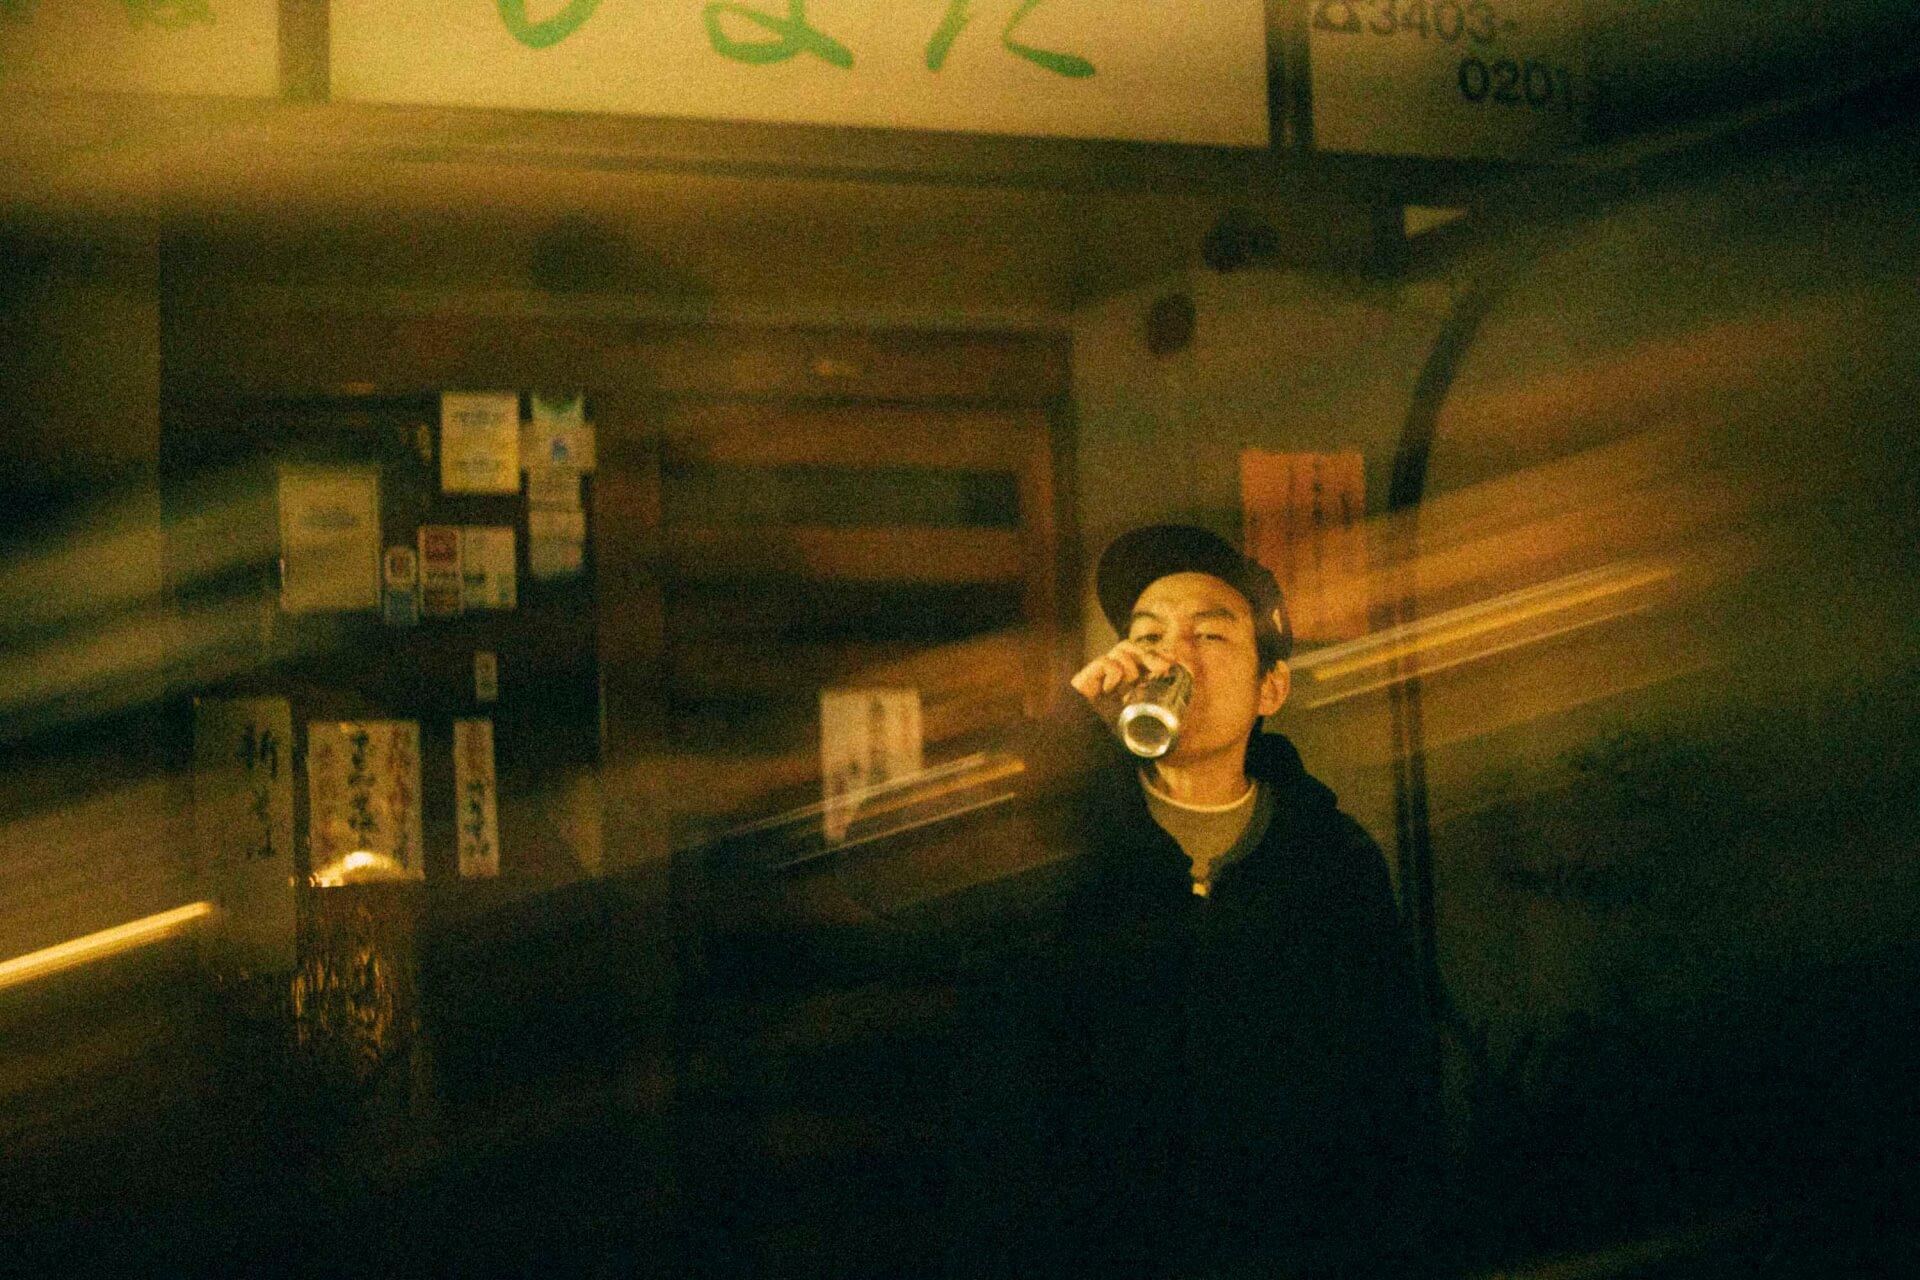 "So I'm Your Friend ―― 原島""ど真ん中""宙芳、インタヴュー interview1903-harashima-michiyoshi"